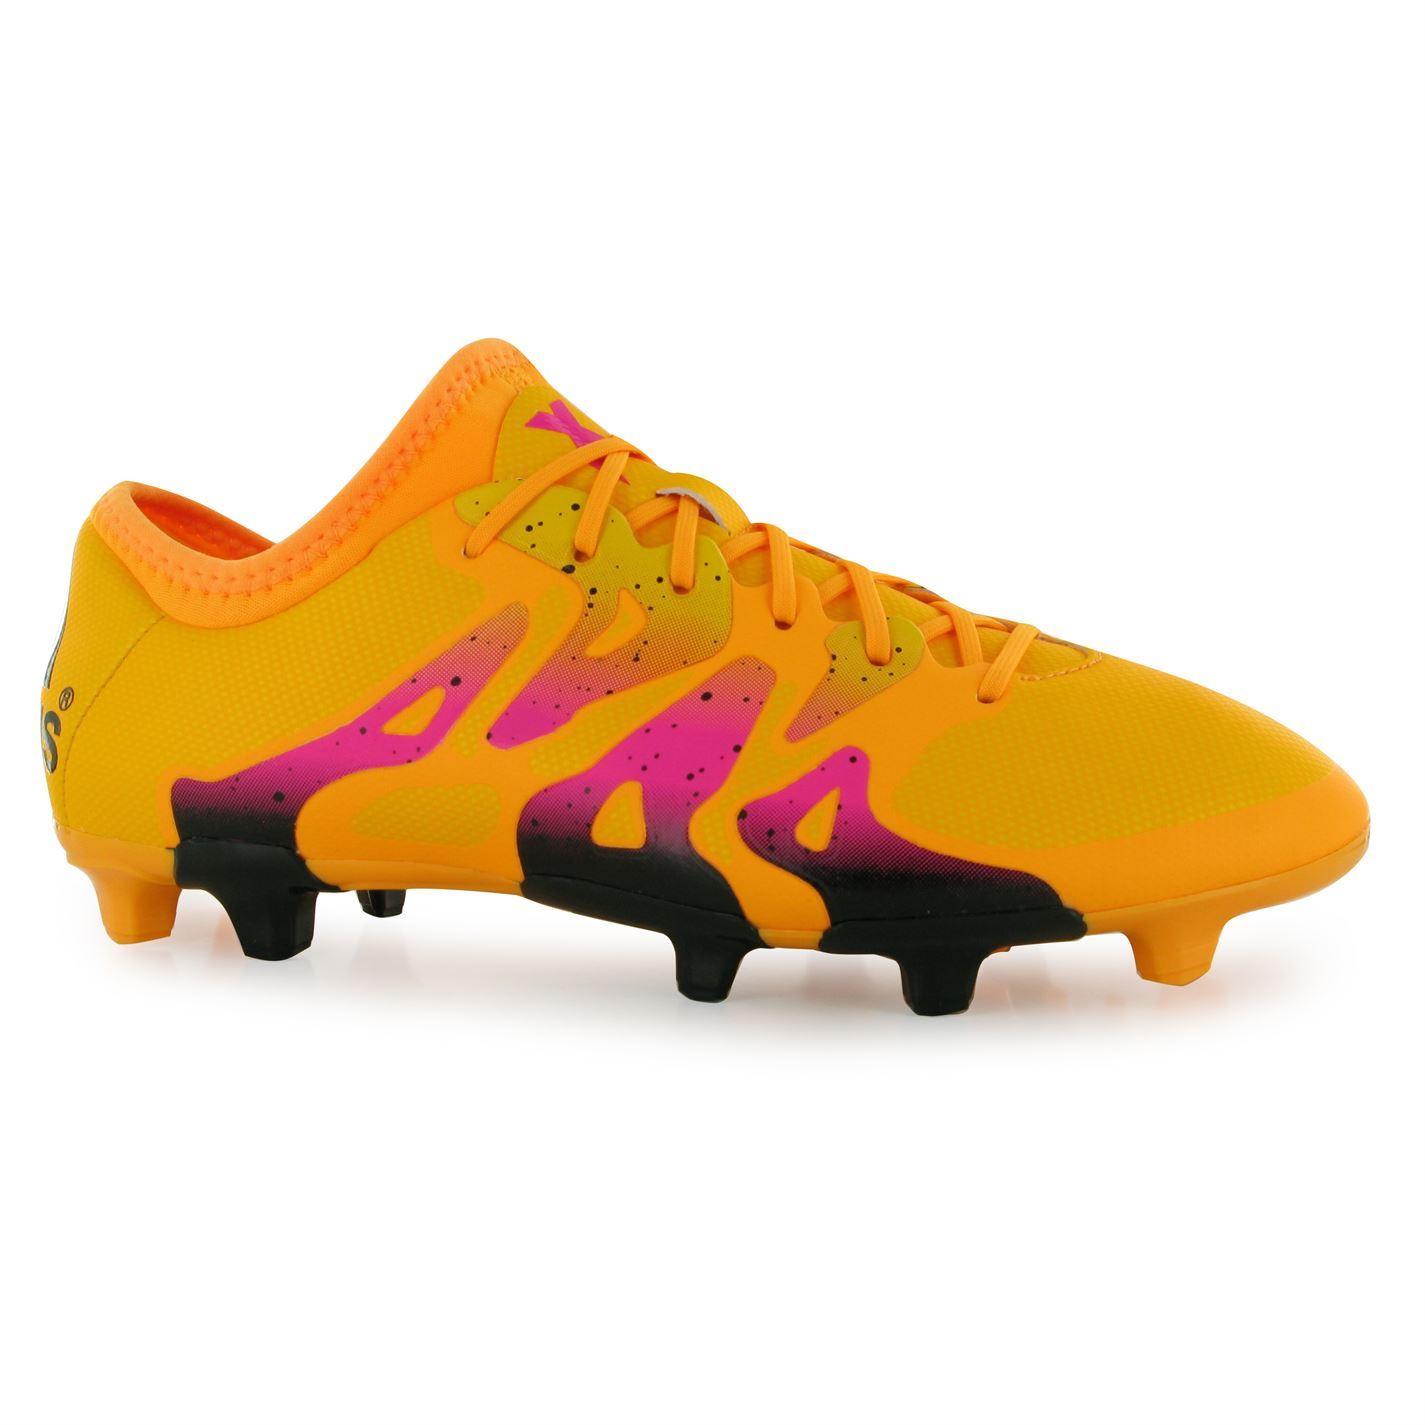 buy popular 2d2cd 80446 ... botas de futbol ace 16 purecontrol fg ag rojo azul cheap adidas x 15.2  fg firm ground football boots mens orange soccer cleats shoes 4bf22 a2445  ...